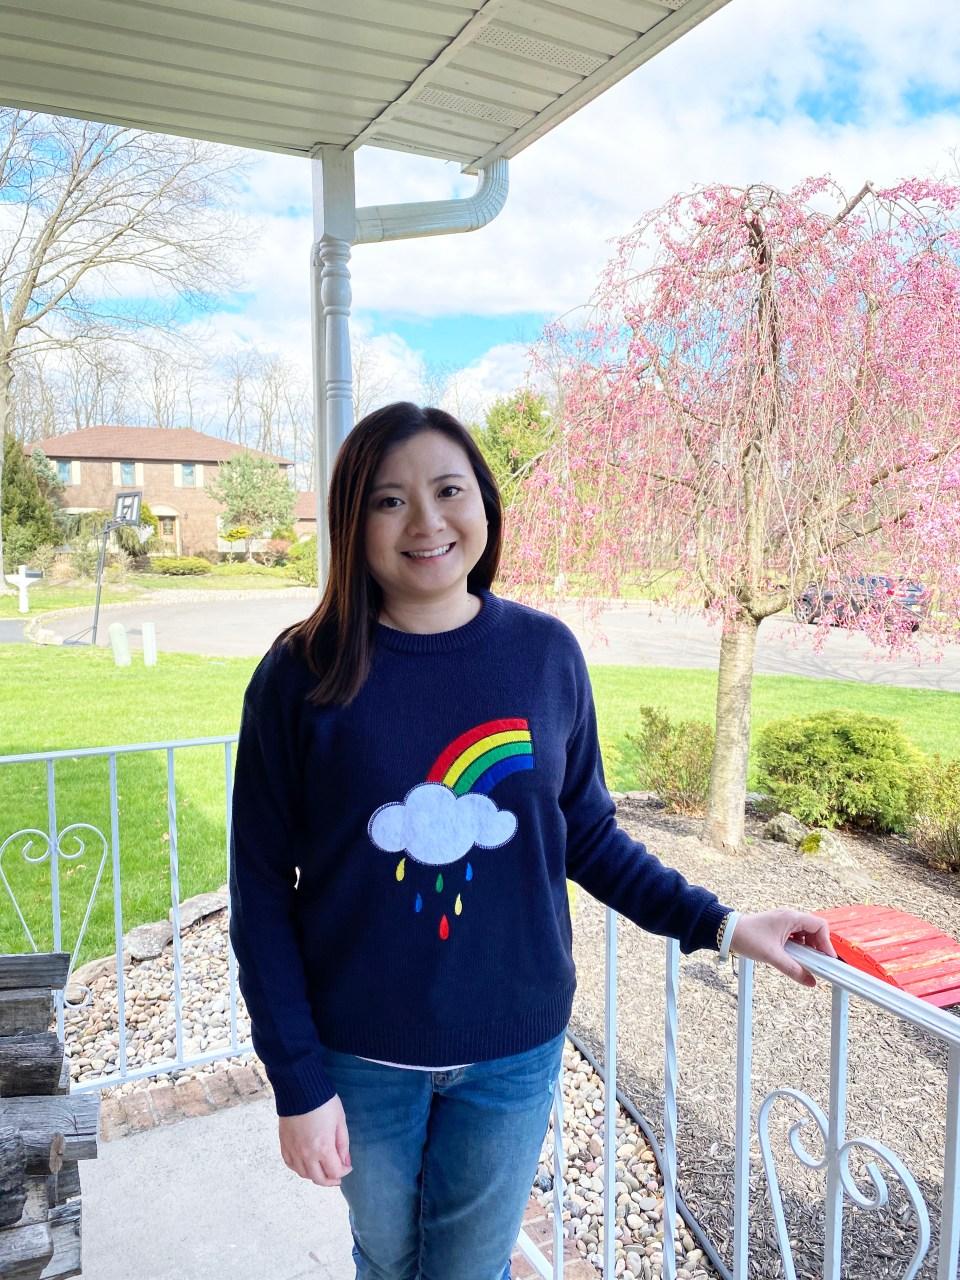 Rainbow & Cloud Sweater 11